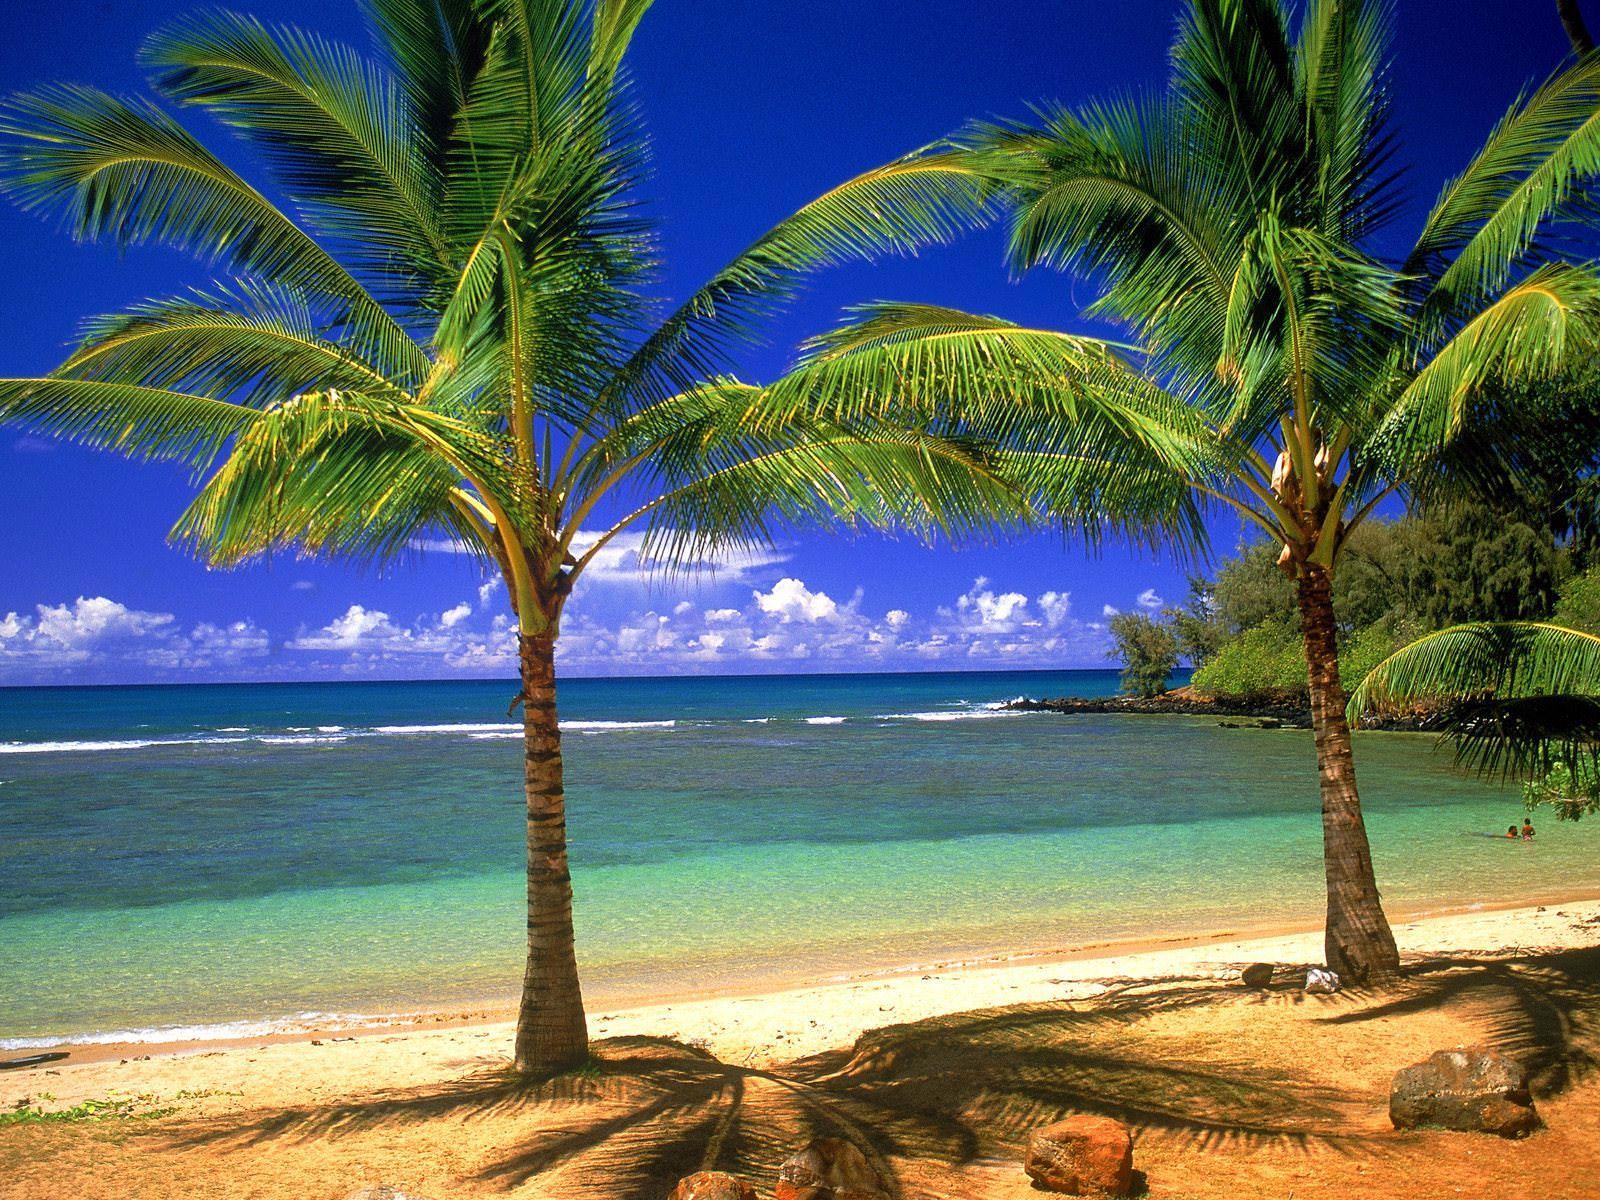 Tropical Beach Scene Wallpaper 1 - Beach And Palm Tree - HD Wallpaper